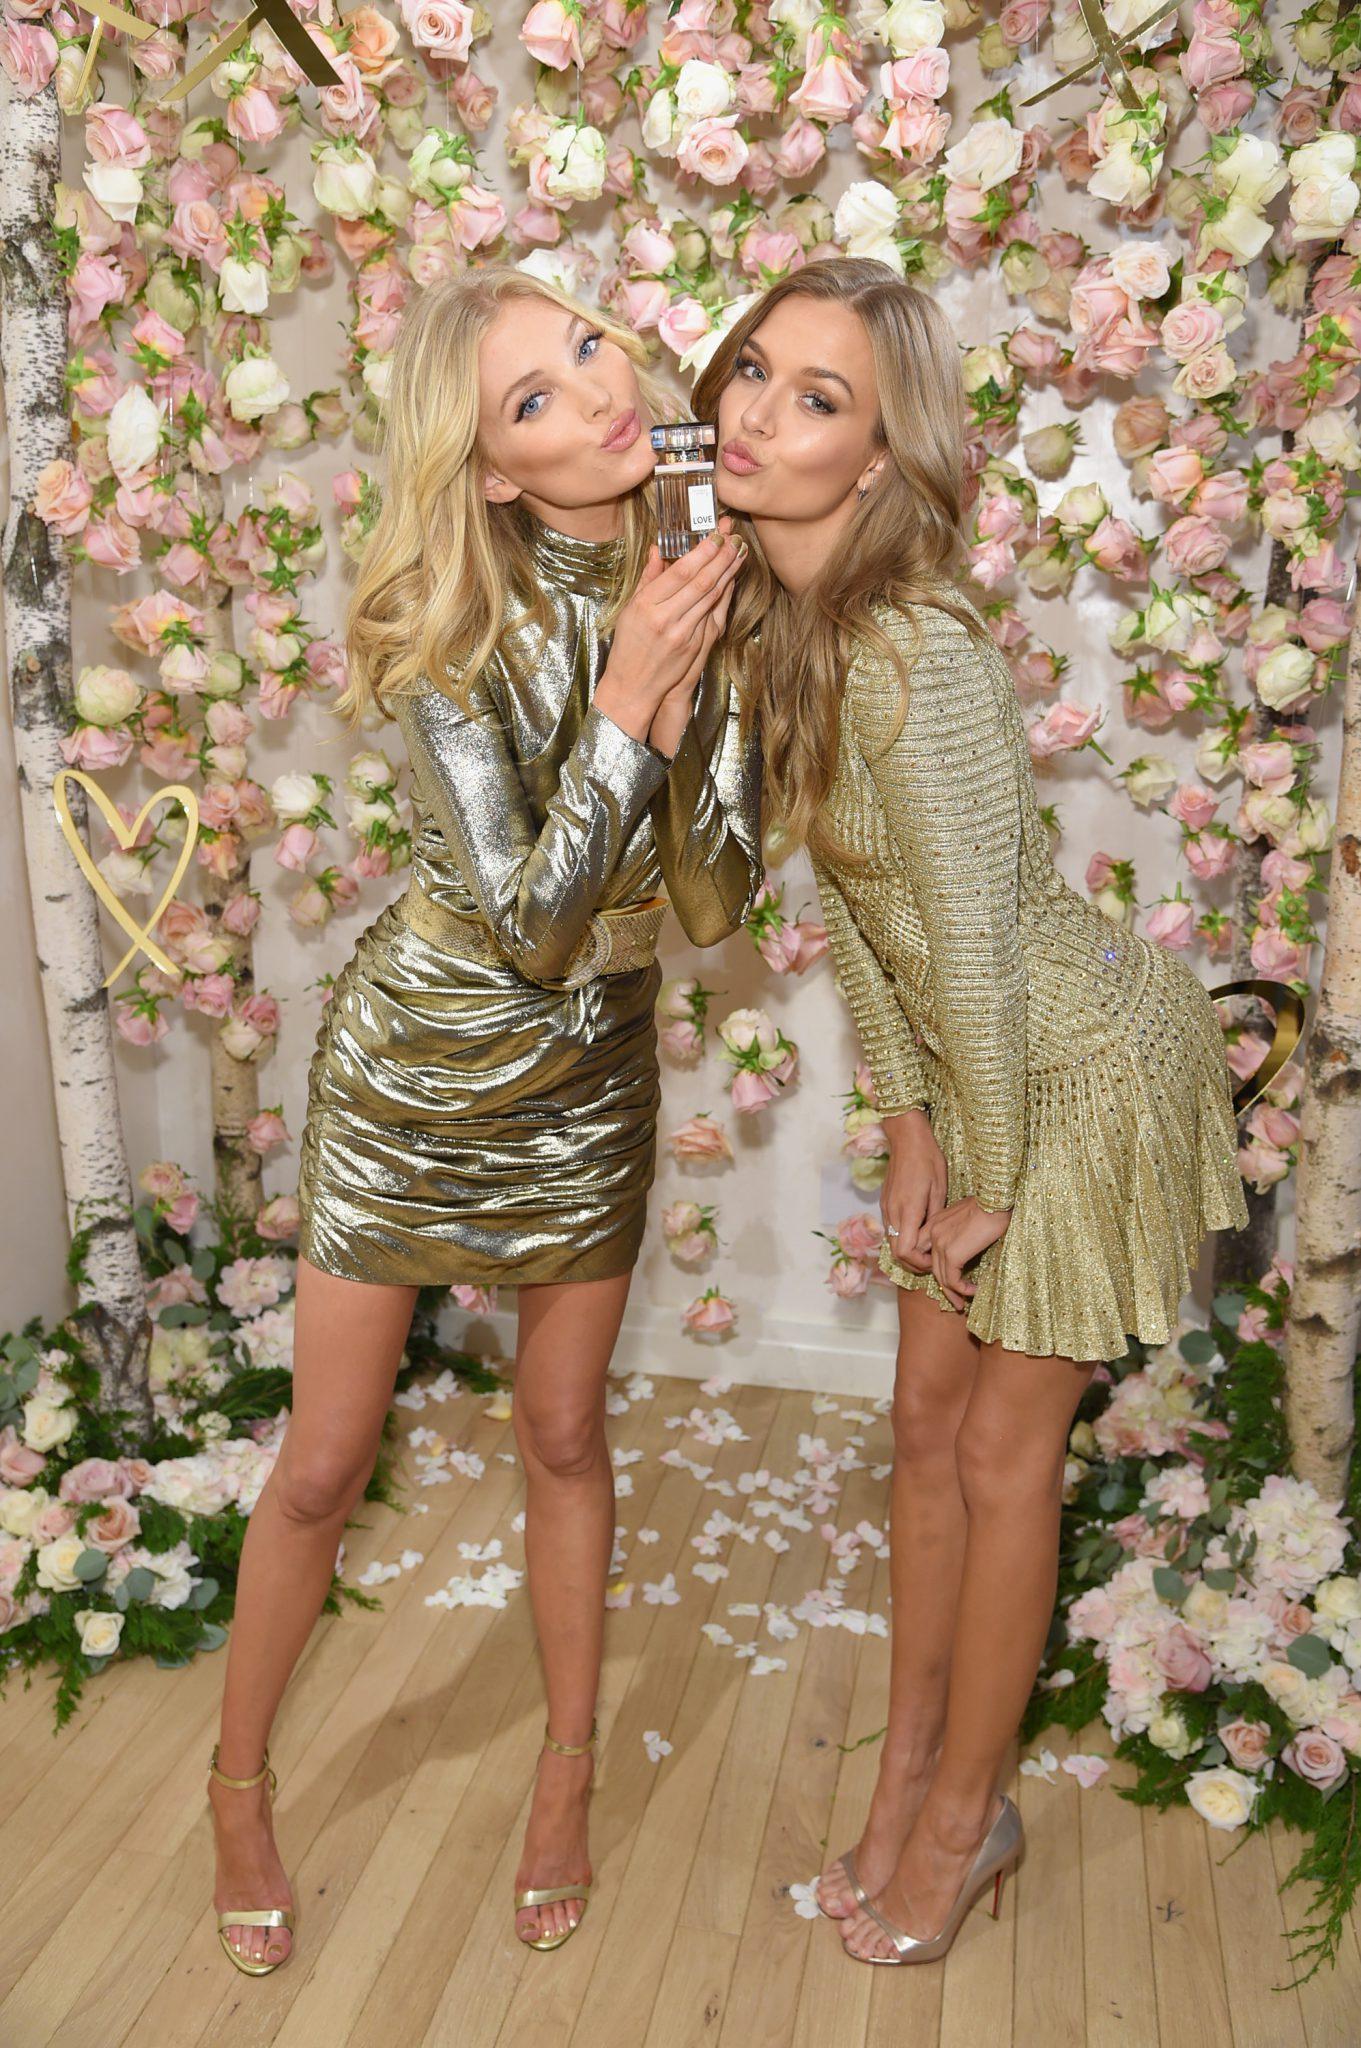 Victoria's Secret Angels Josephine Skriver And Elsa Hosk Celebrate The All-New LOVE Fragrance